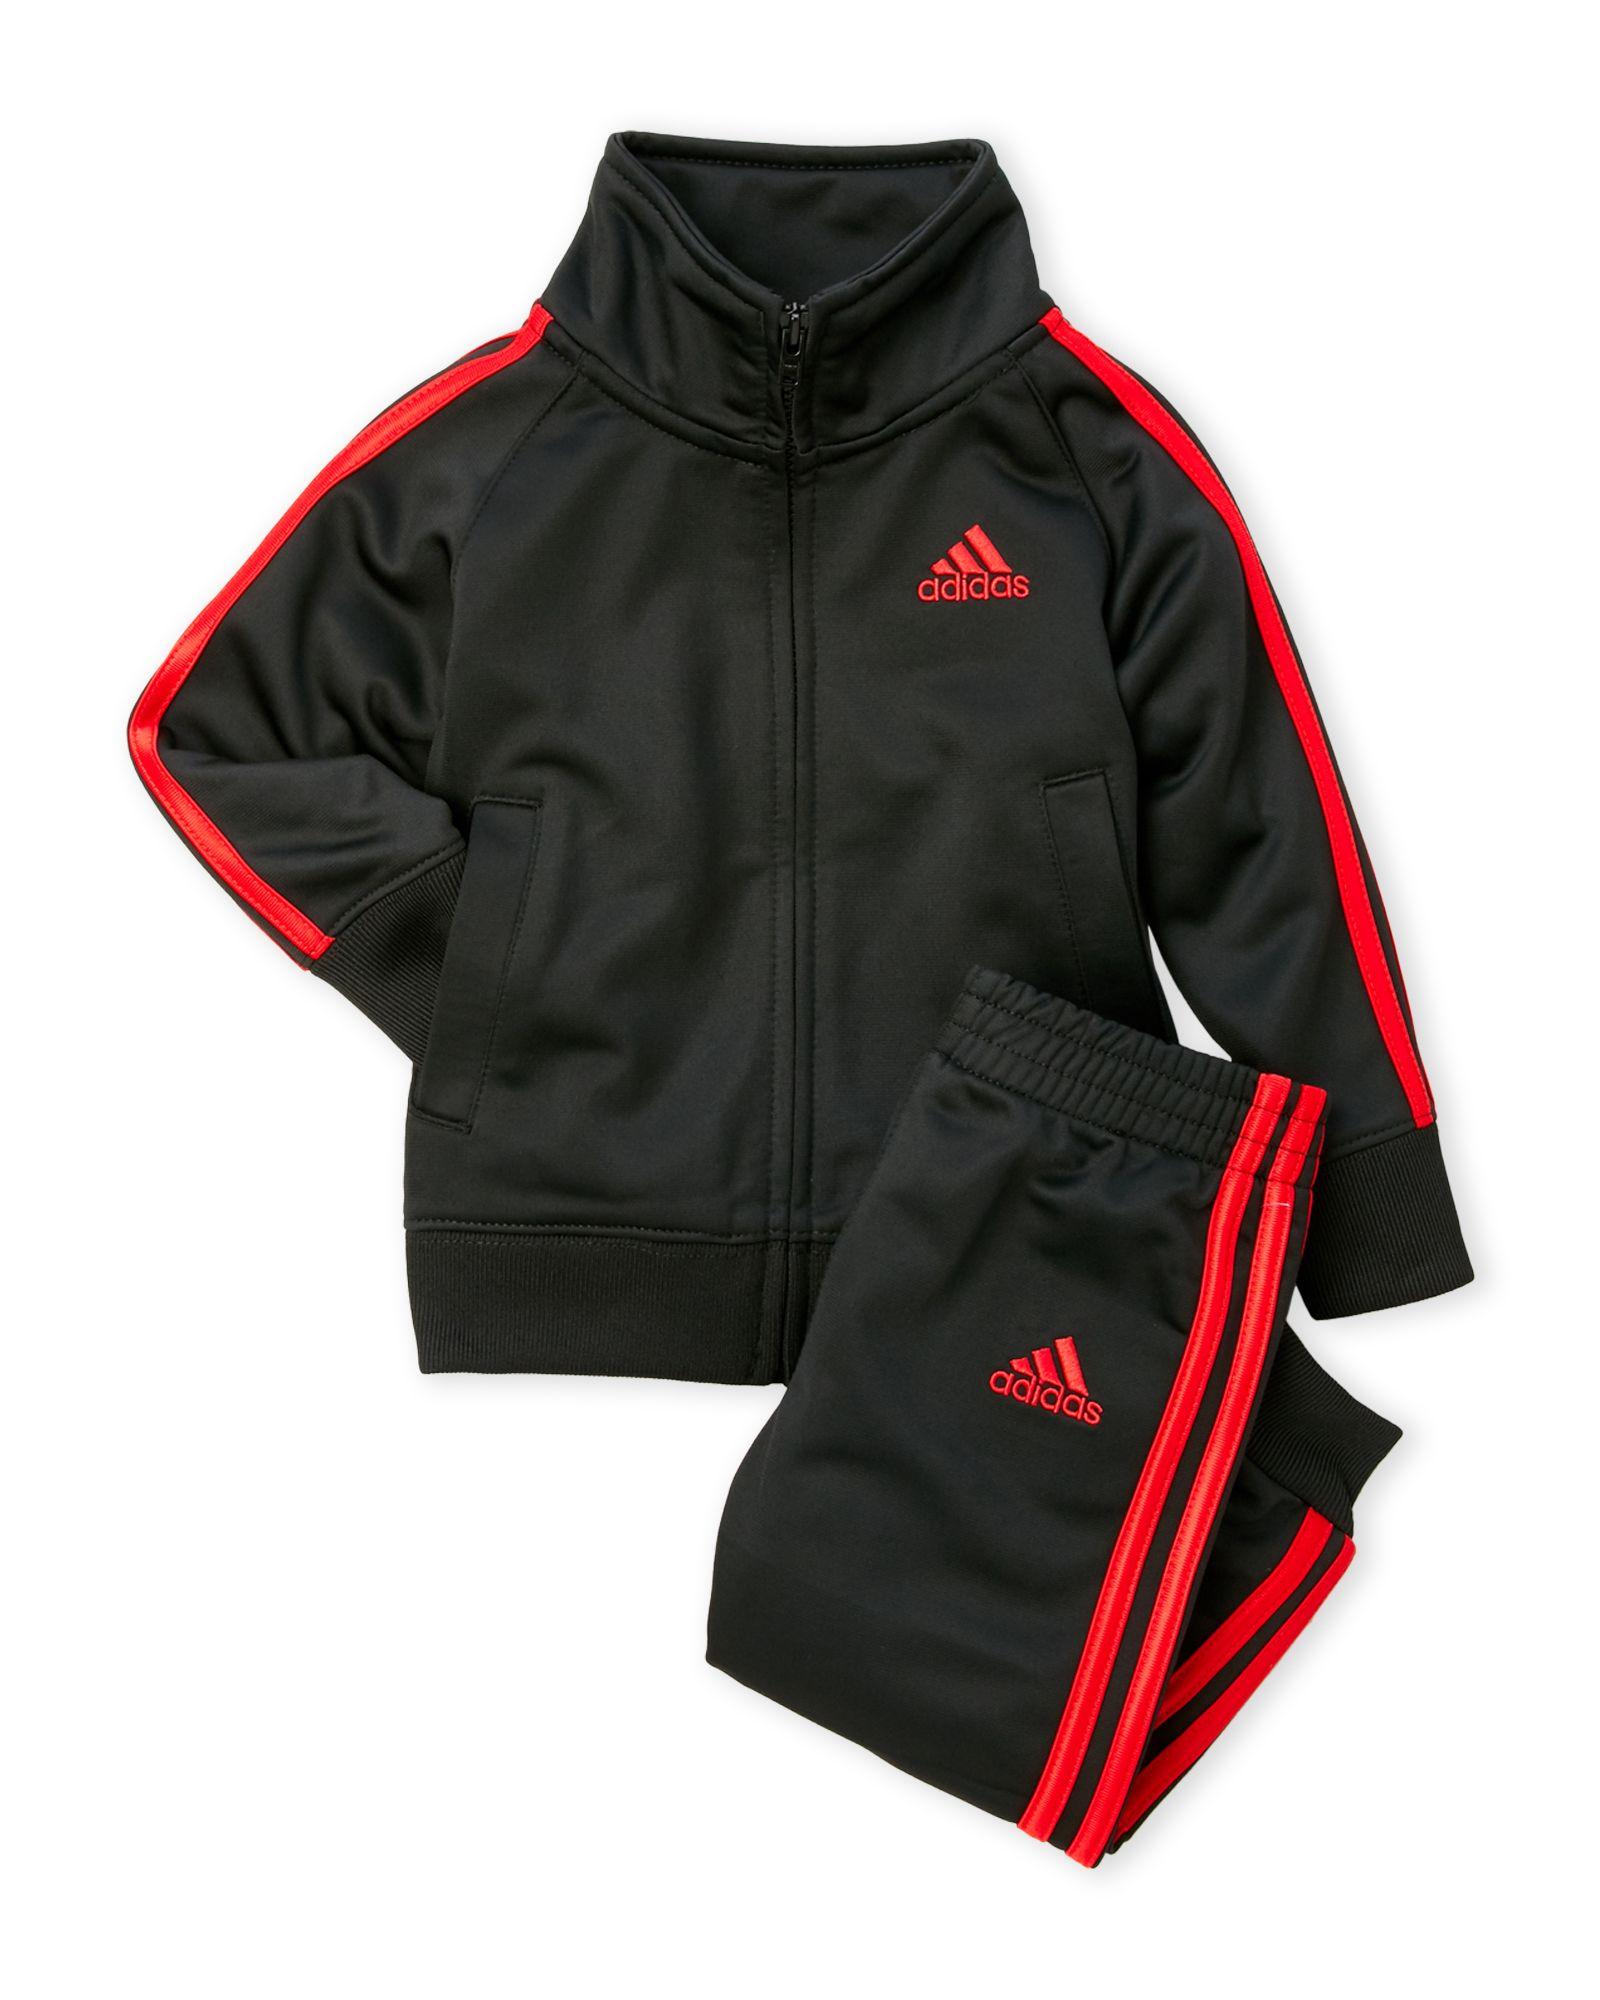 8773b6674a Nike Boys 2-Piece Tricot Tracksuit Pants Set Outfit Sportswear Boys